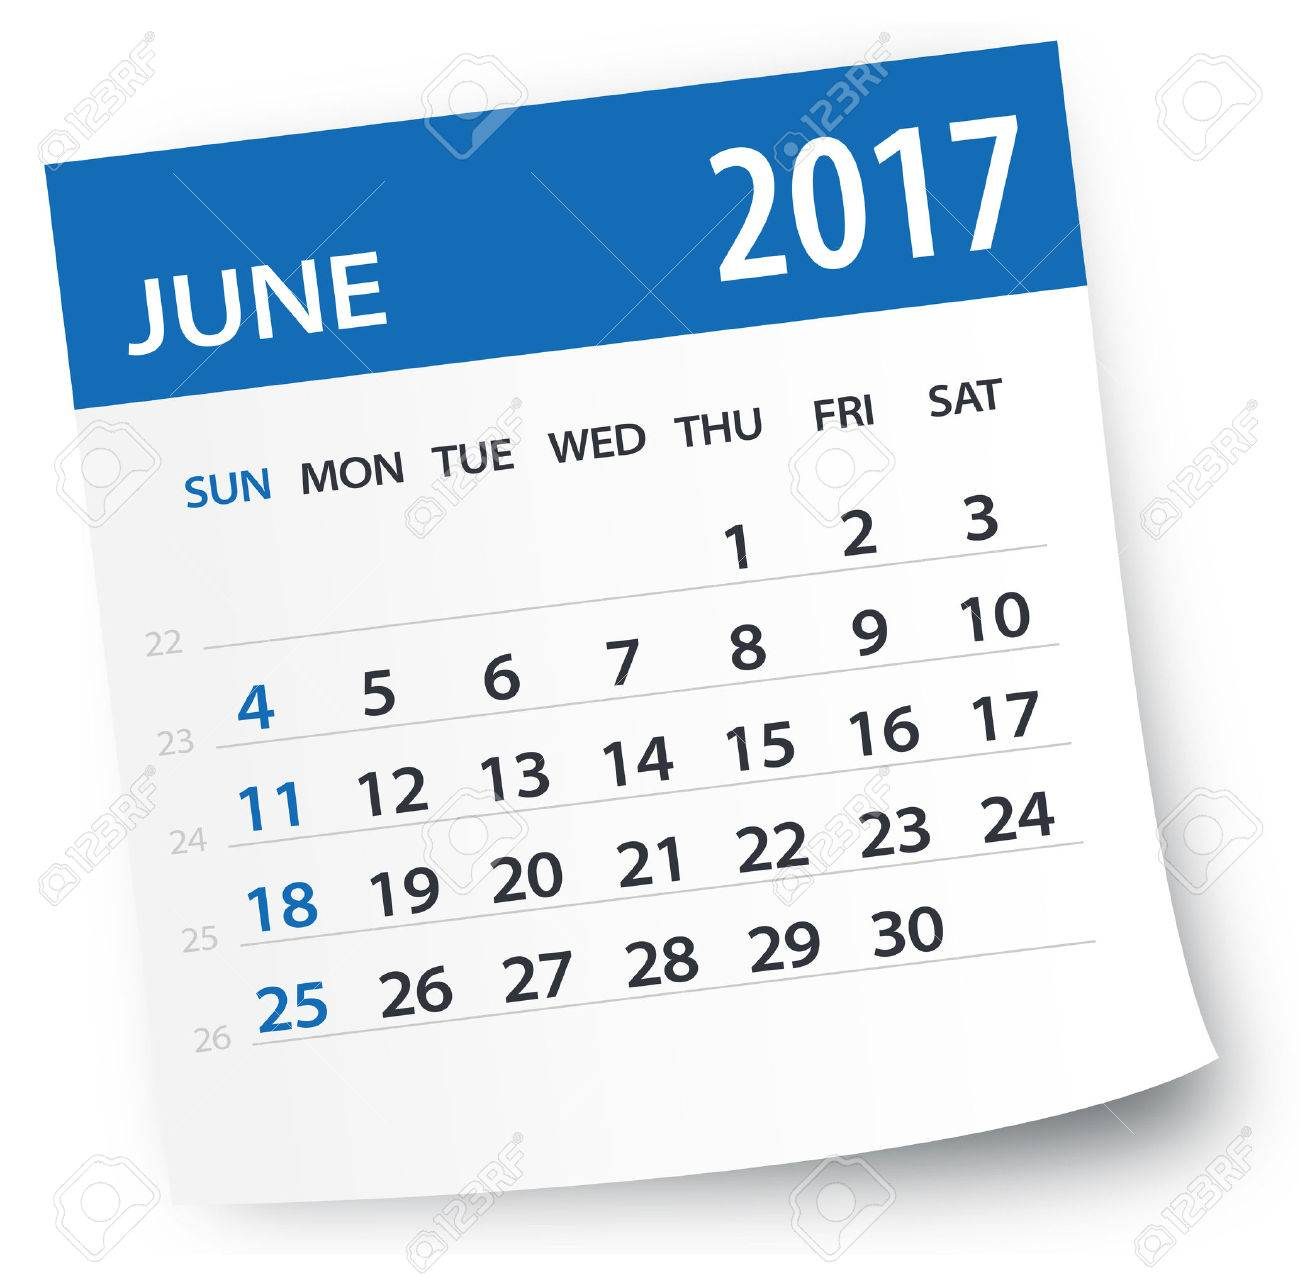 June 2017 Calendar.